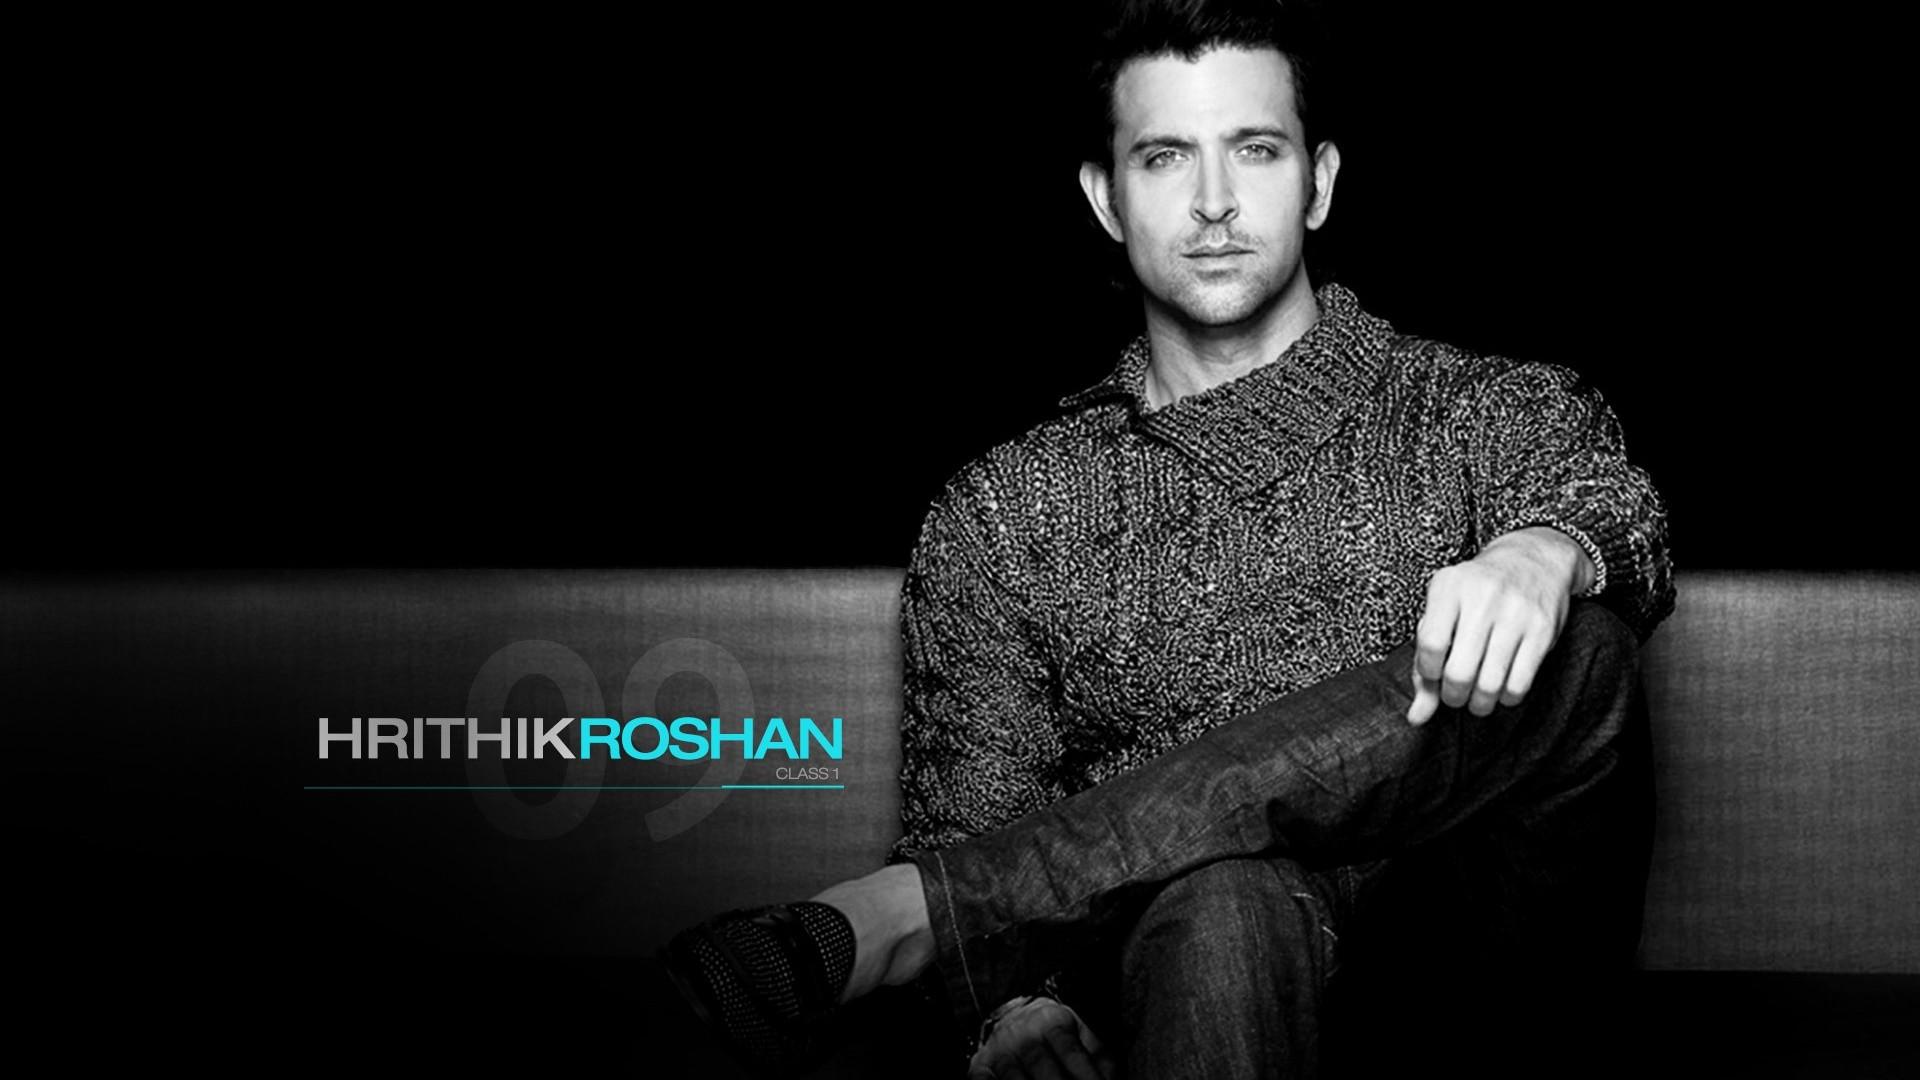 Hrithik Roshan HD Wallpapers Free Download.jpg12